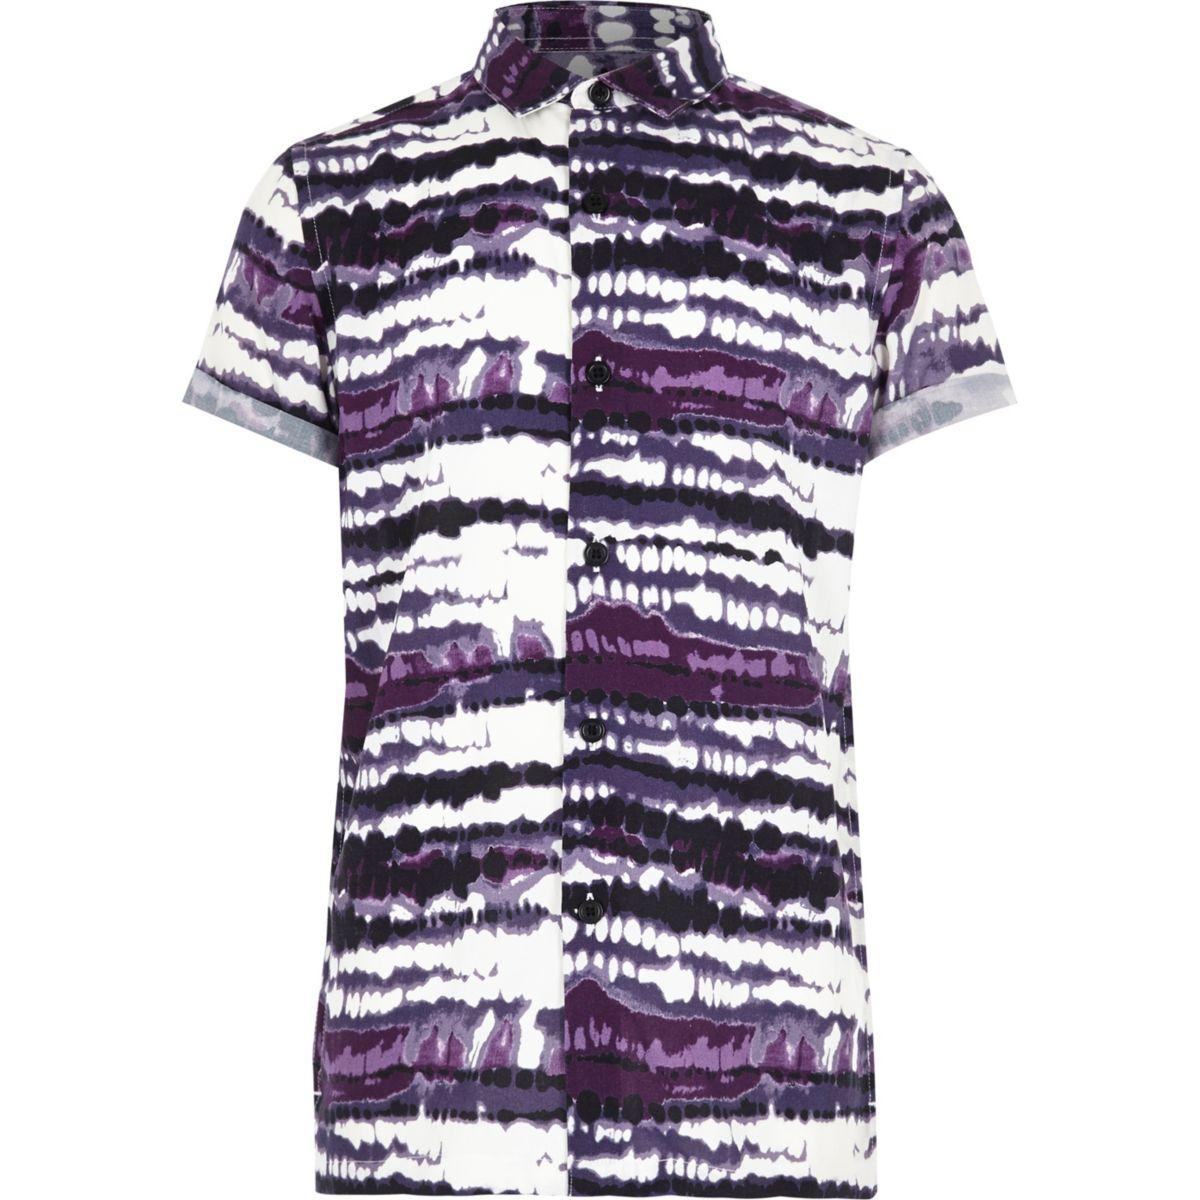 Boys purple tie dye print short sleeve shirt